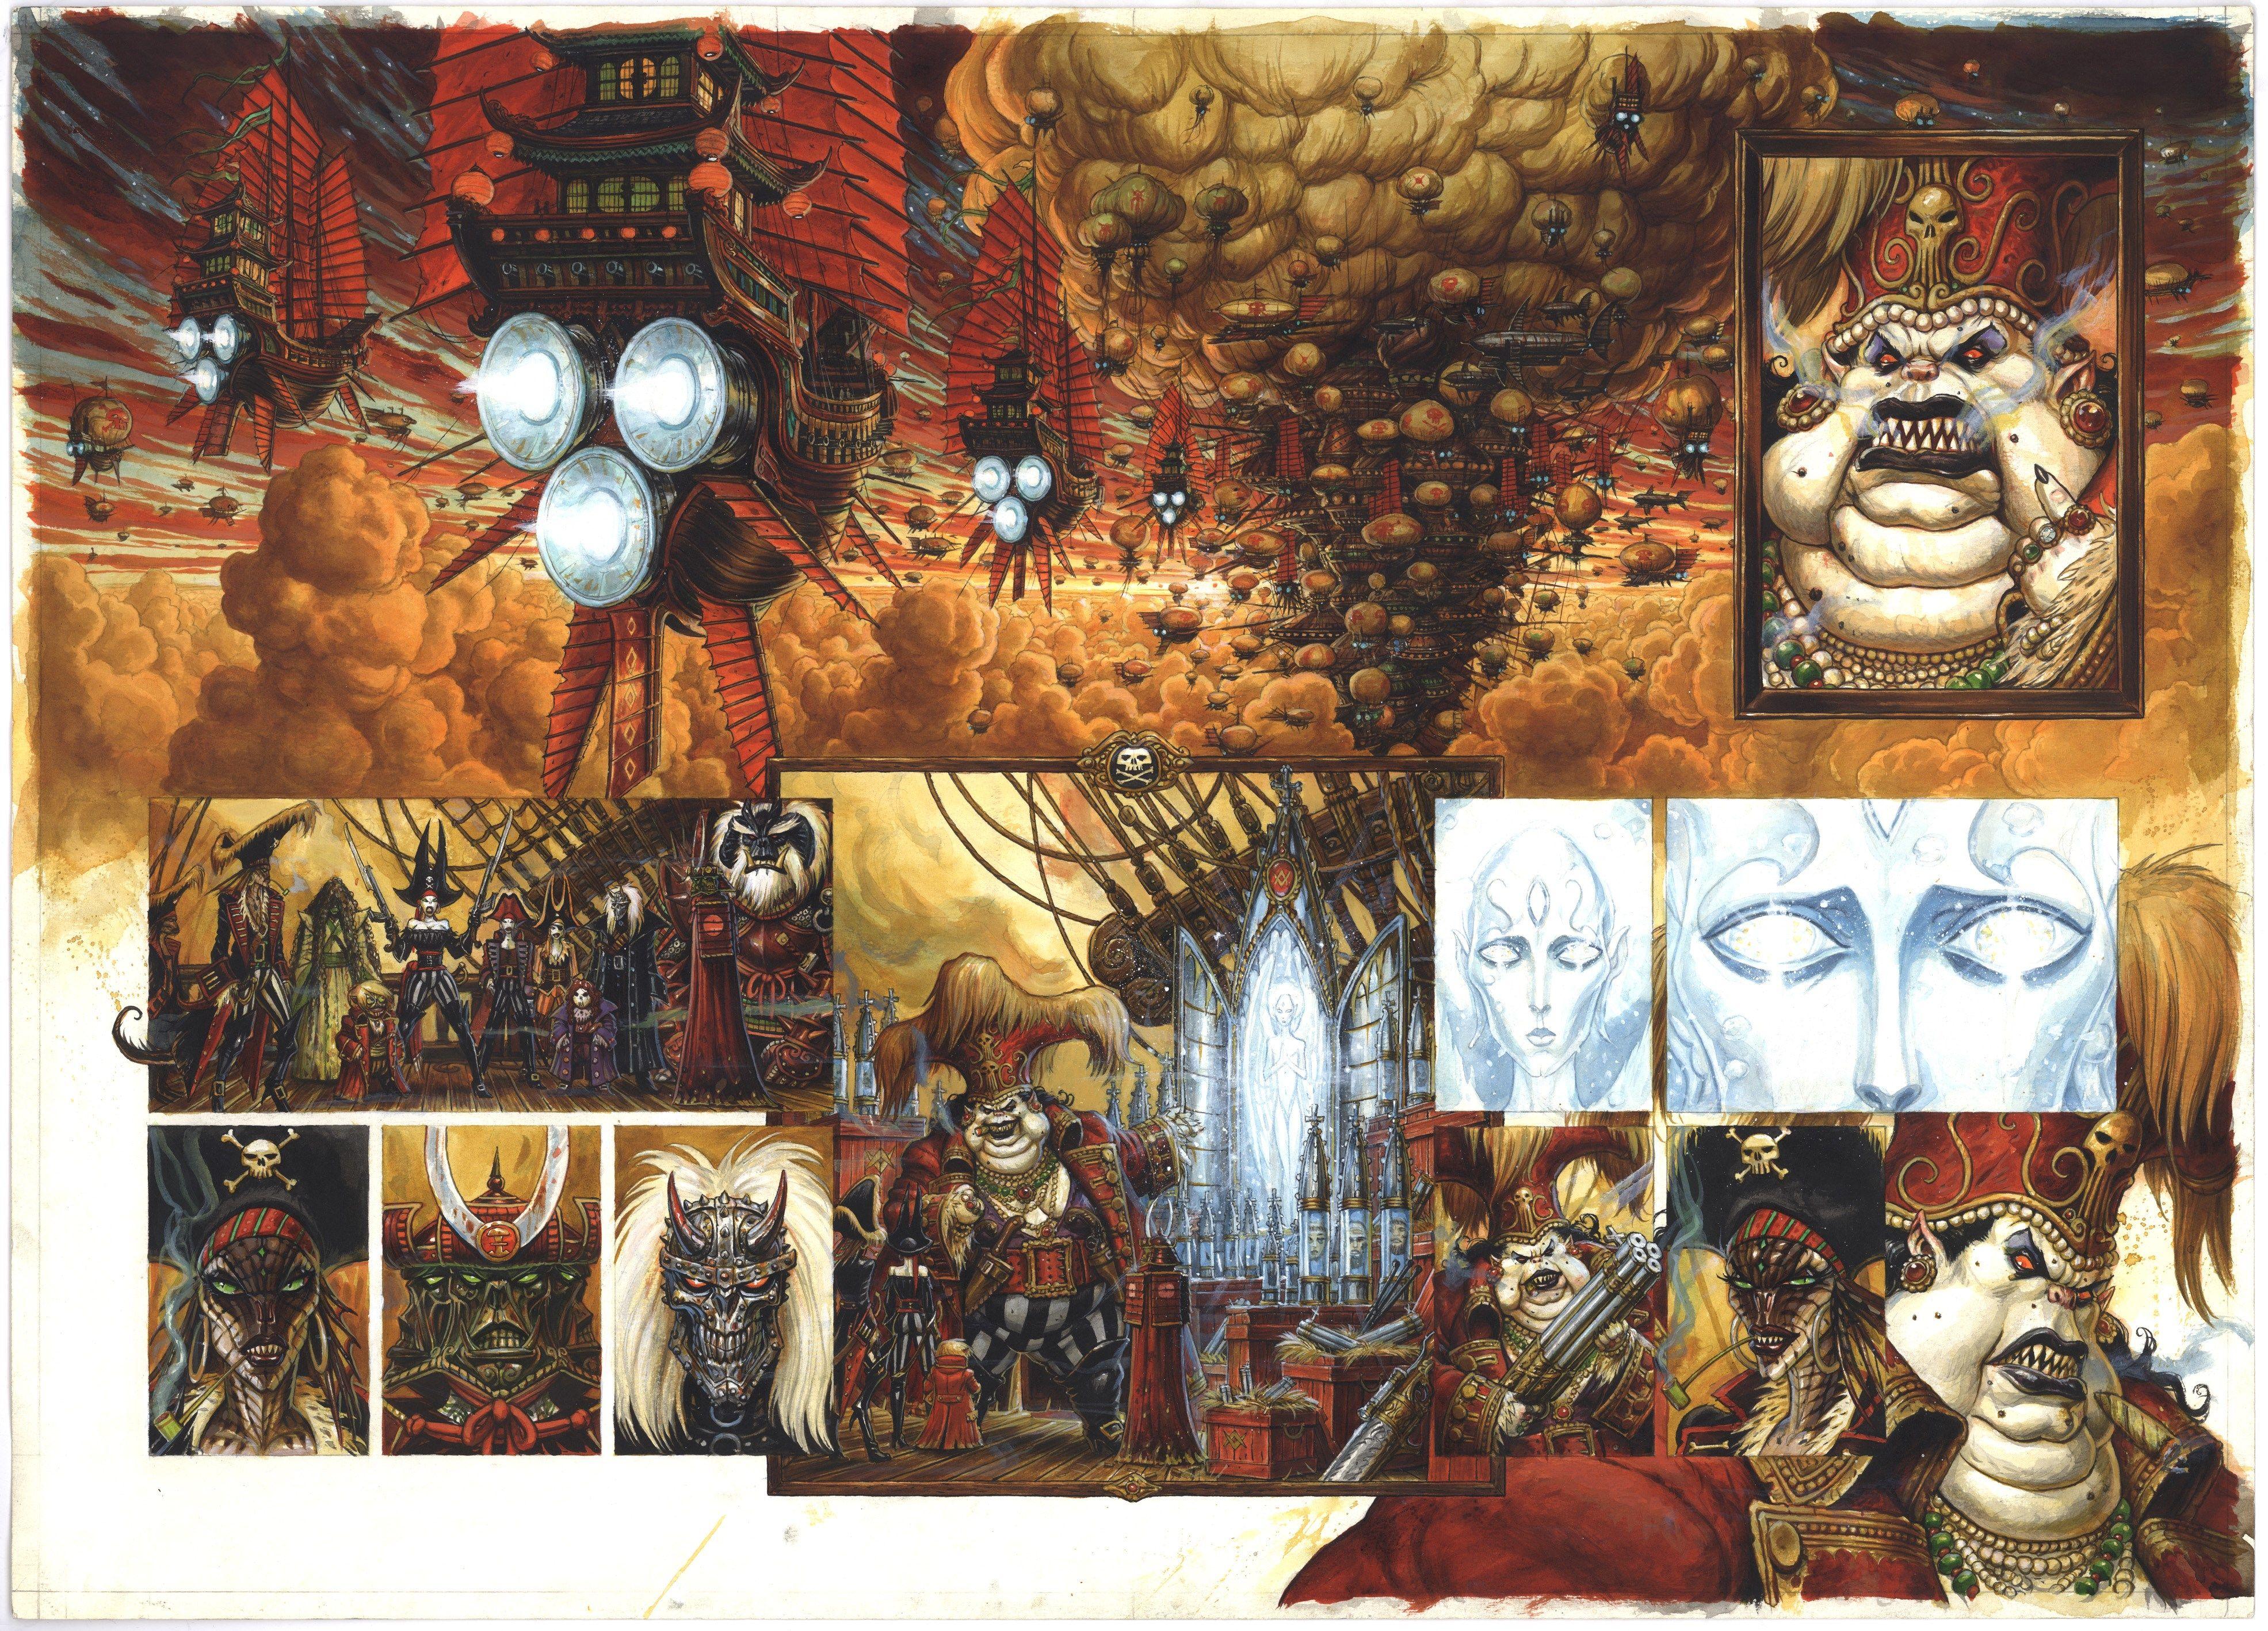 #4k requiem chevalier vampire hd wallpaper (3942x2835)